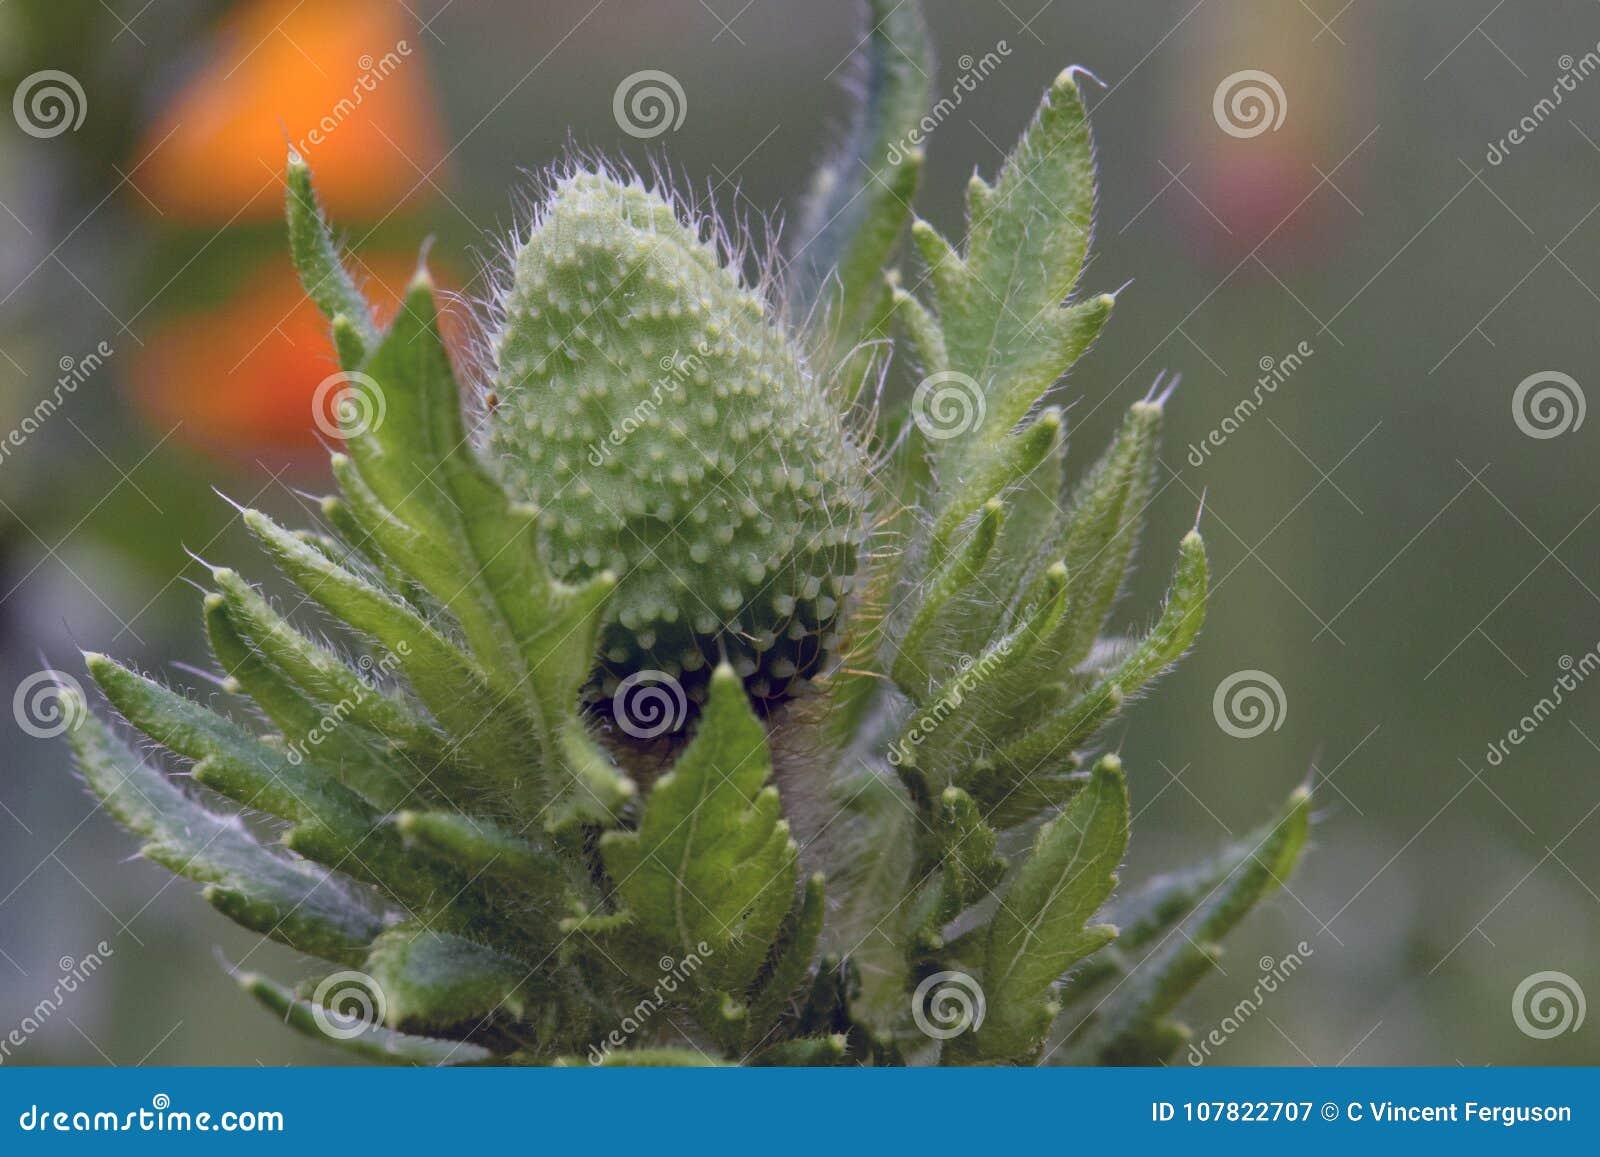 Green Poppy Pod In Leaves Stock Image Image Of Green 107822707